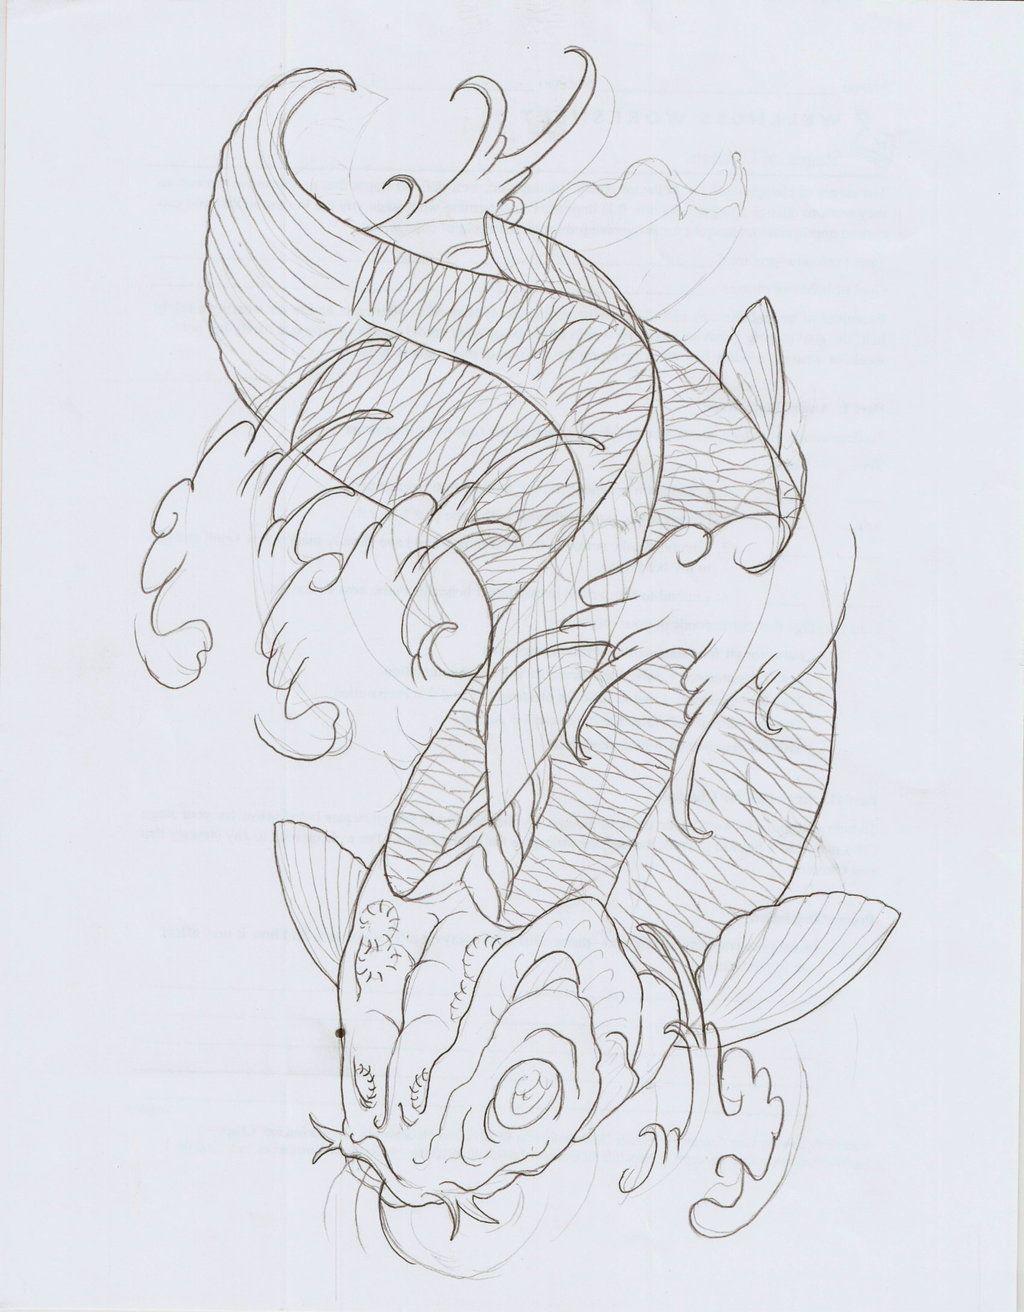 Koi Fish Xi Outline By Eltri On Deviantart